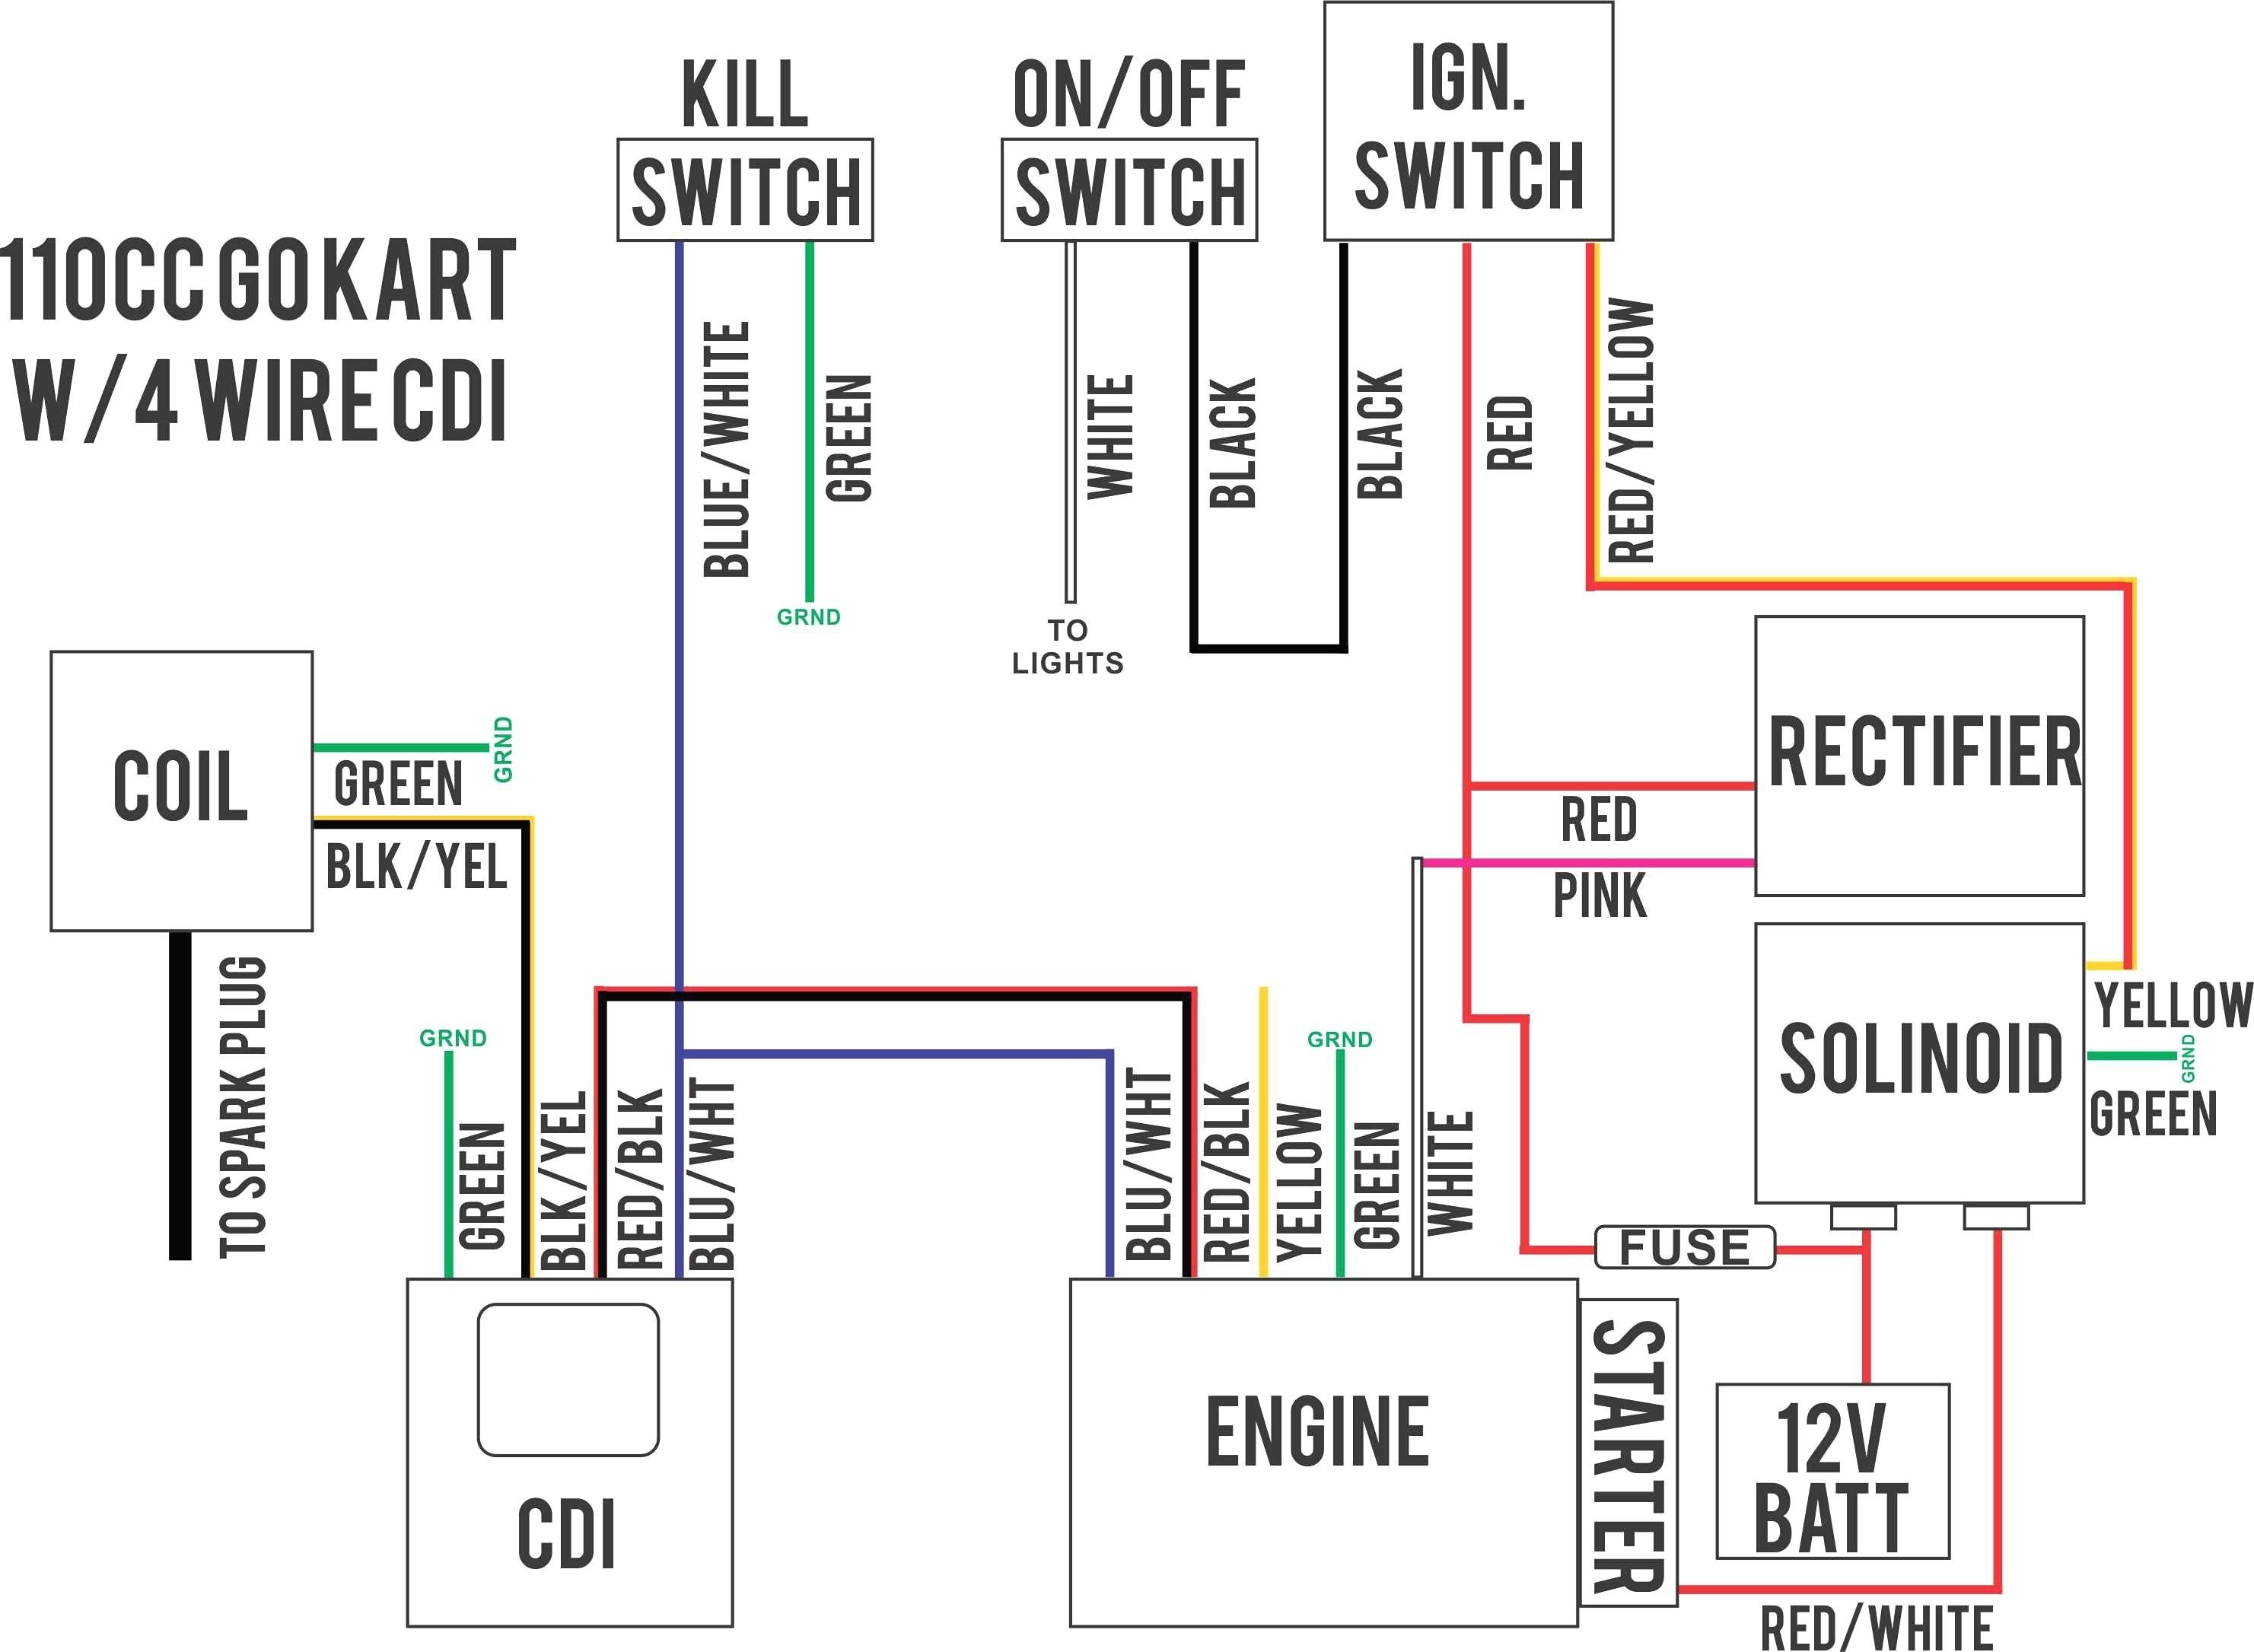 ignition interlock wiring diagram - data wiring diagram drink-greet -  drink-greet.vivarelliauto.it  vivarelliauto.it